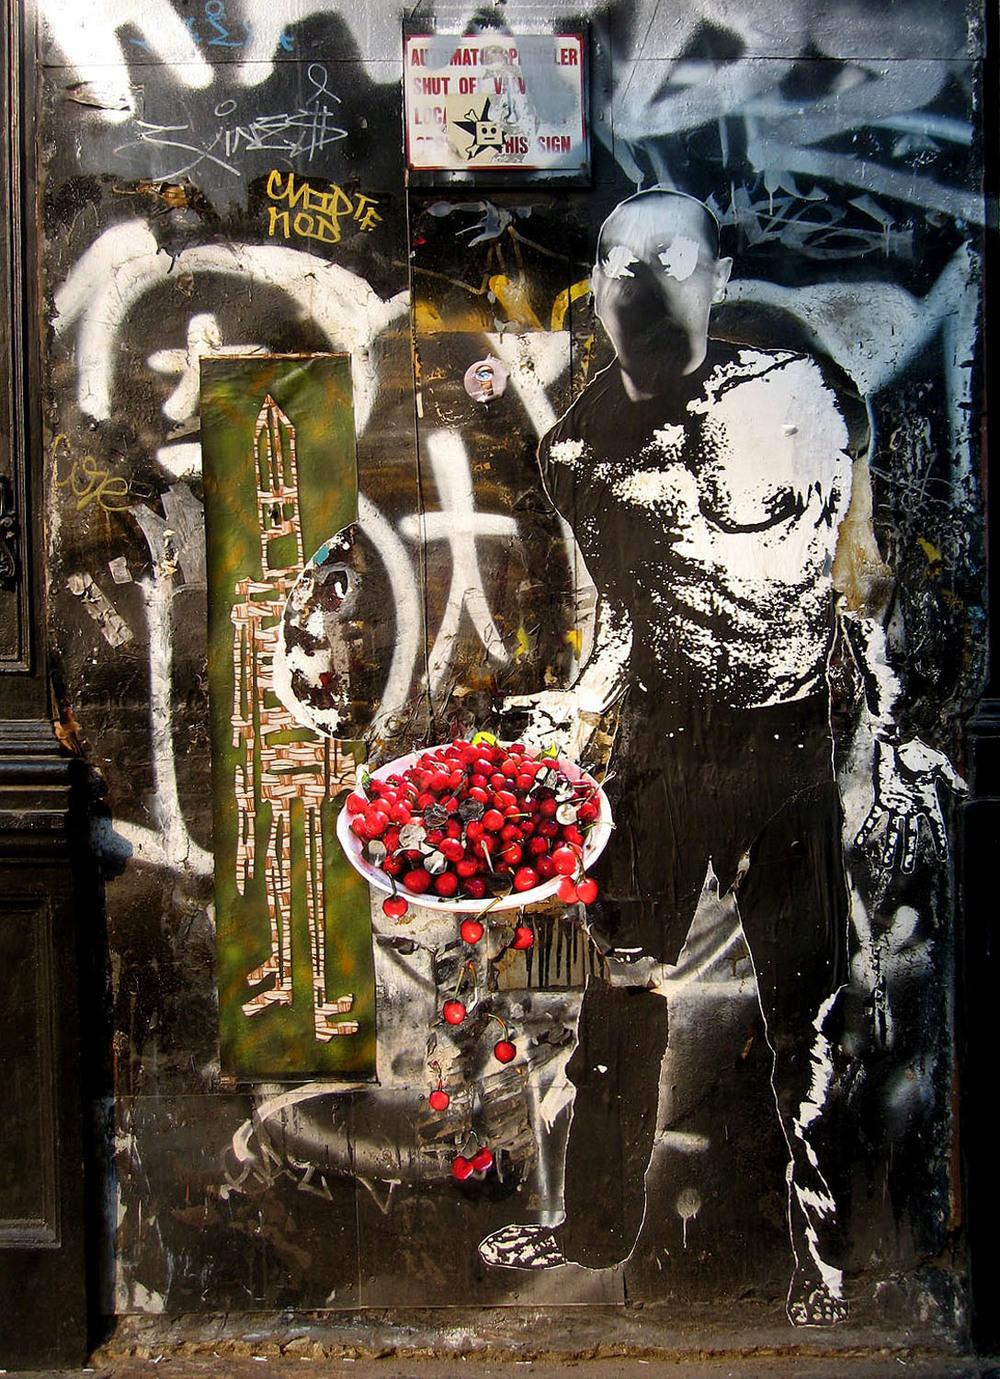 Bowl of Cherries on Howard St., NYC